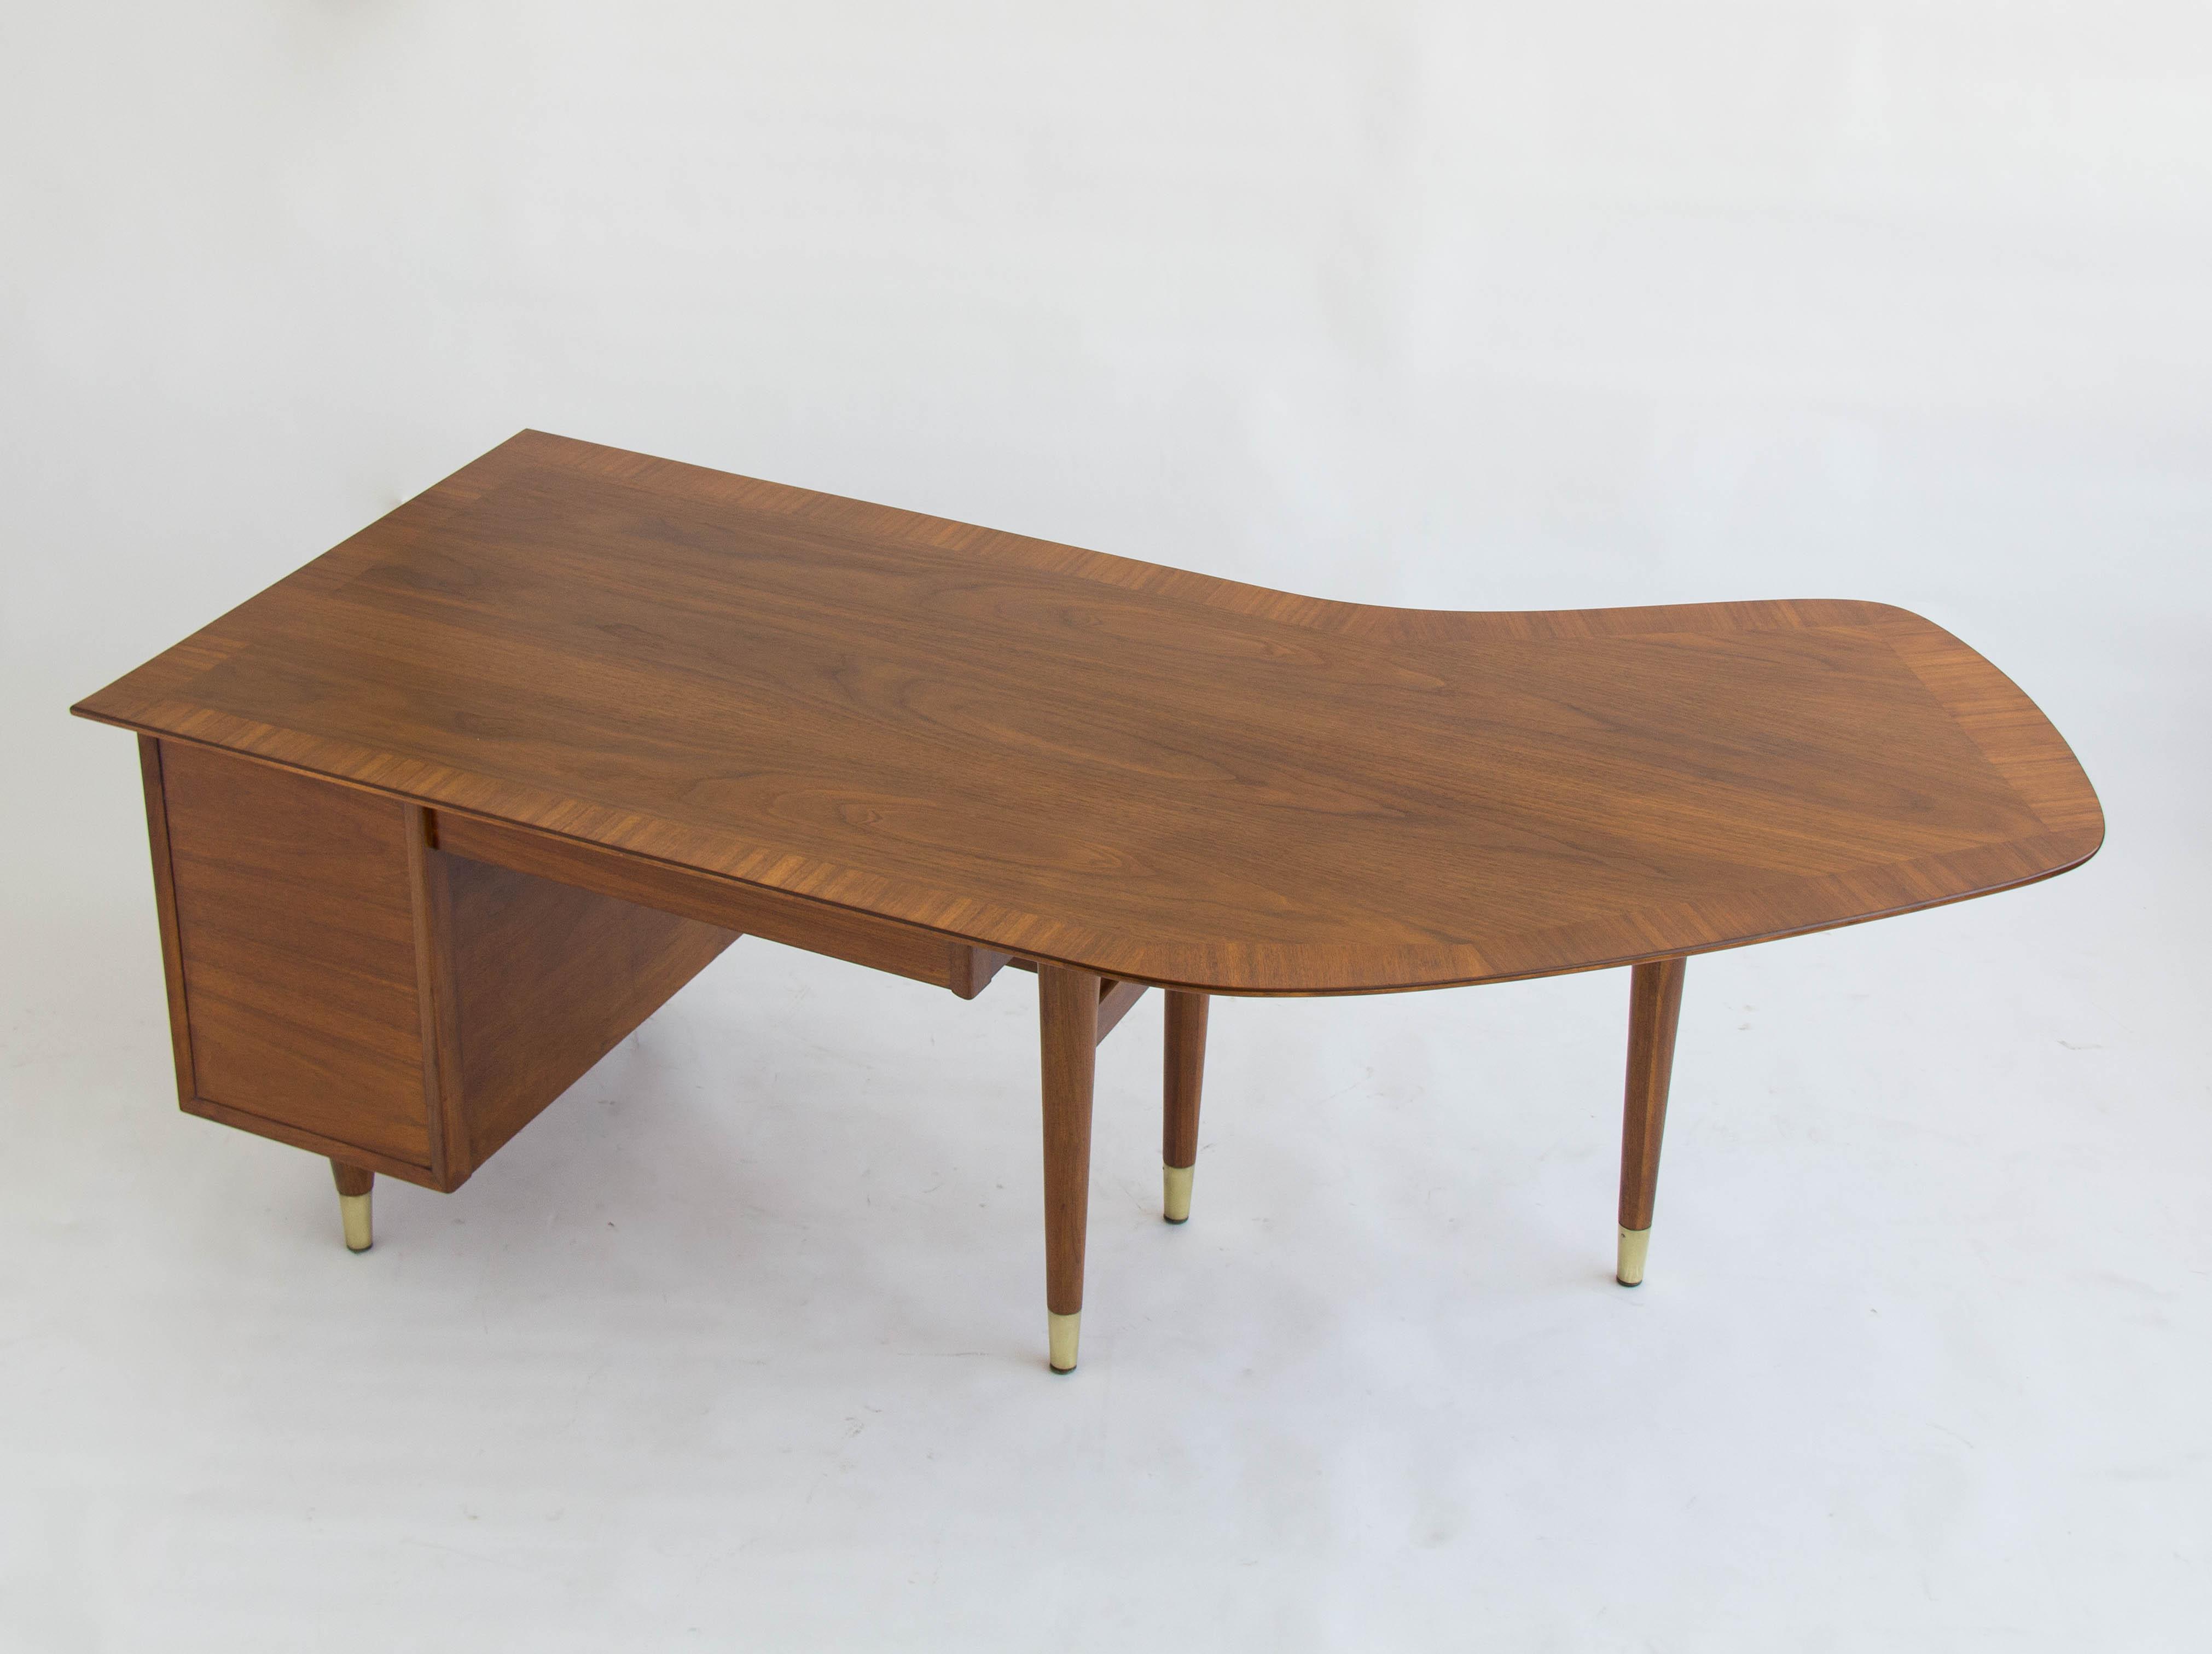 Standard Furniture Co Walnut Executive Desk